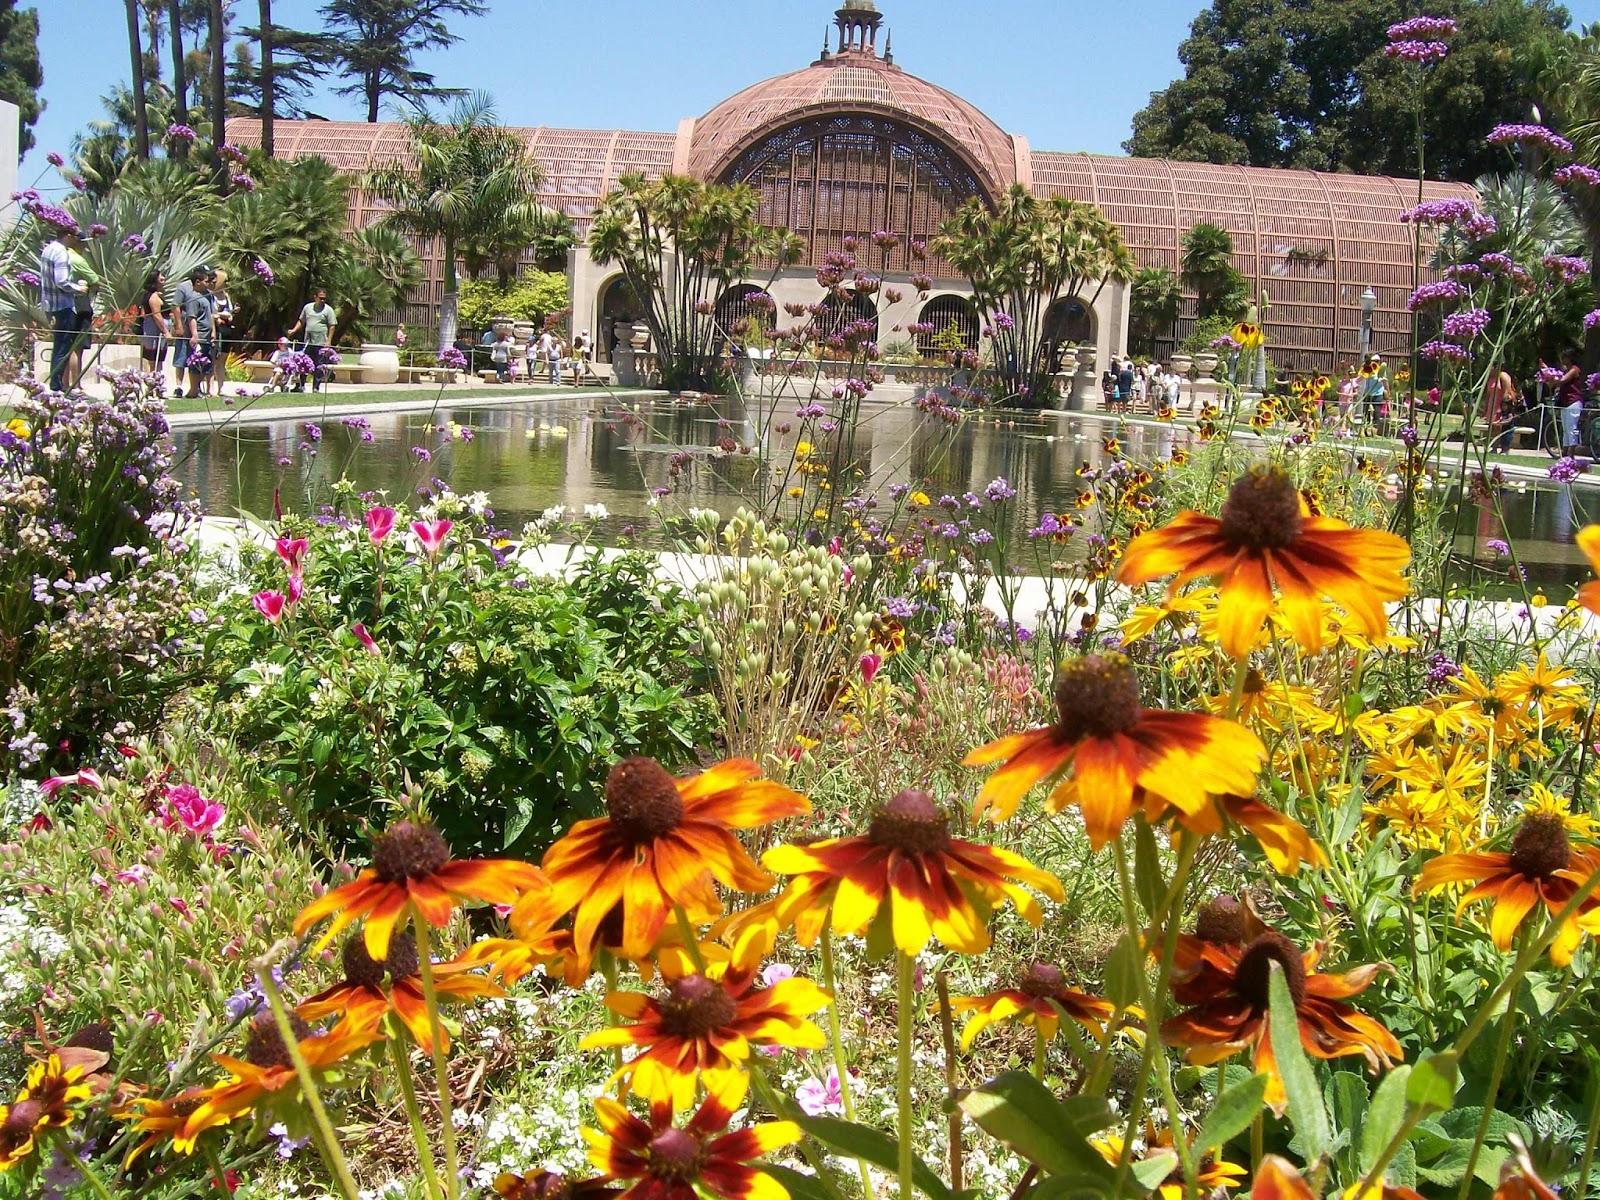 Intuitive Value San Diego Vacation Balboa Park Botanical Bldg Gardens